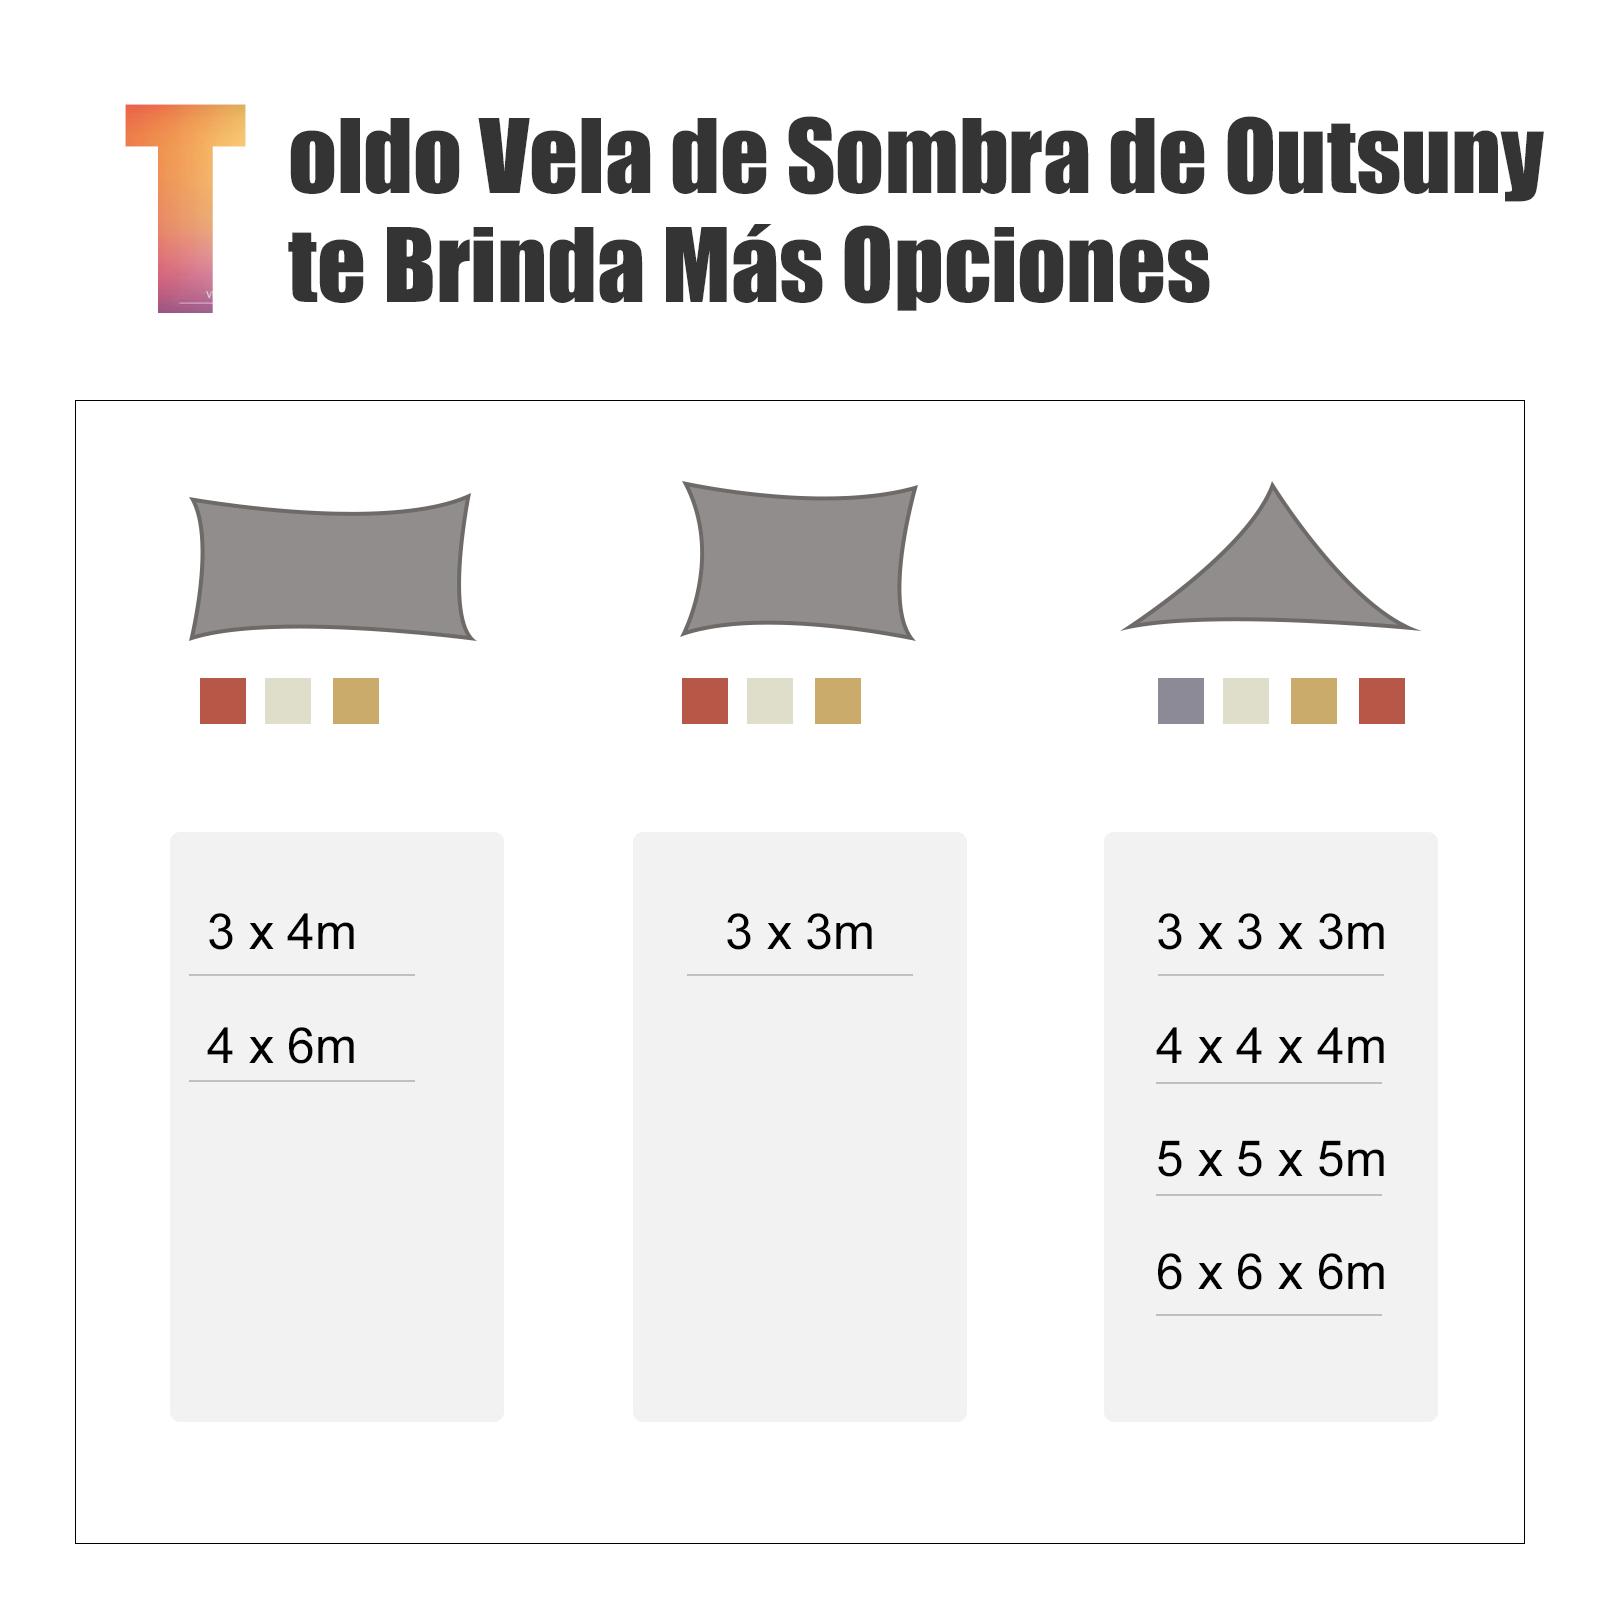 Toldo-Vela-Sombrilla-Parasol-Triangulo-Tejido-de-Poliester-160g-m2-Jardin-Playa miniatura 15